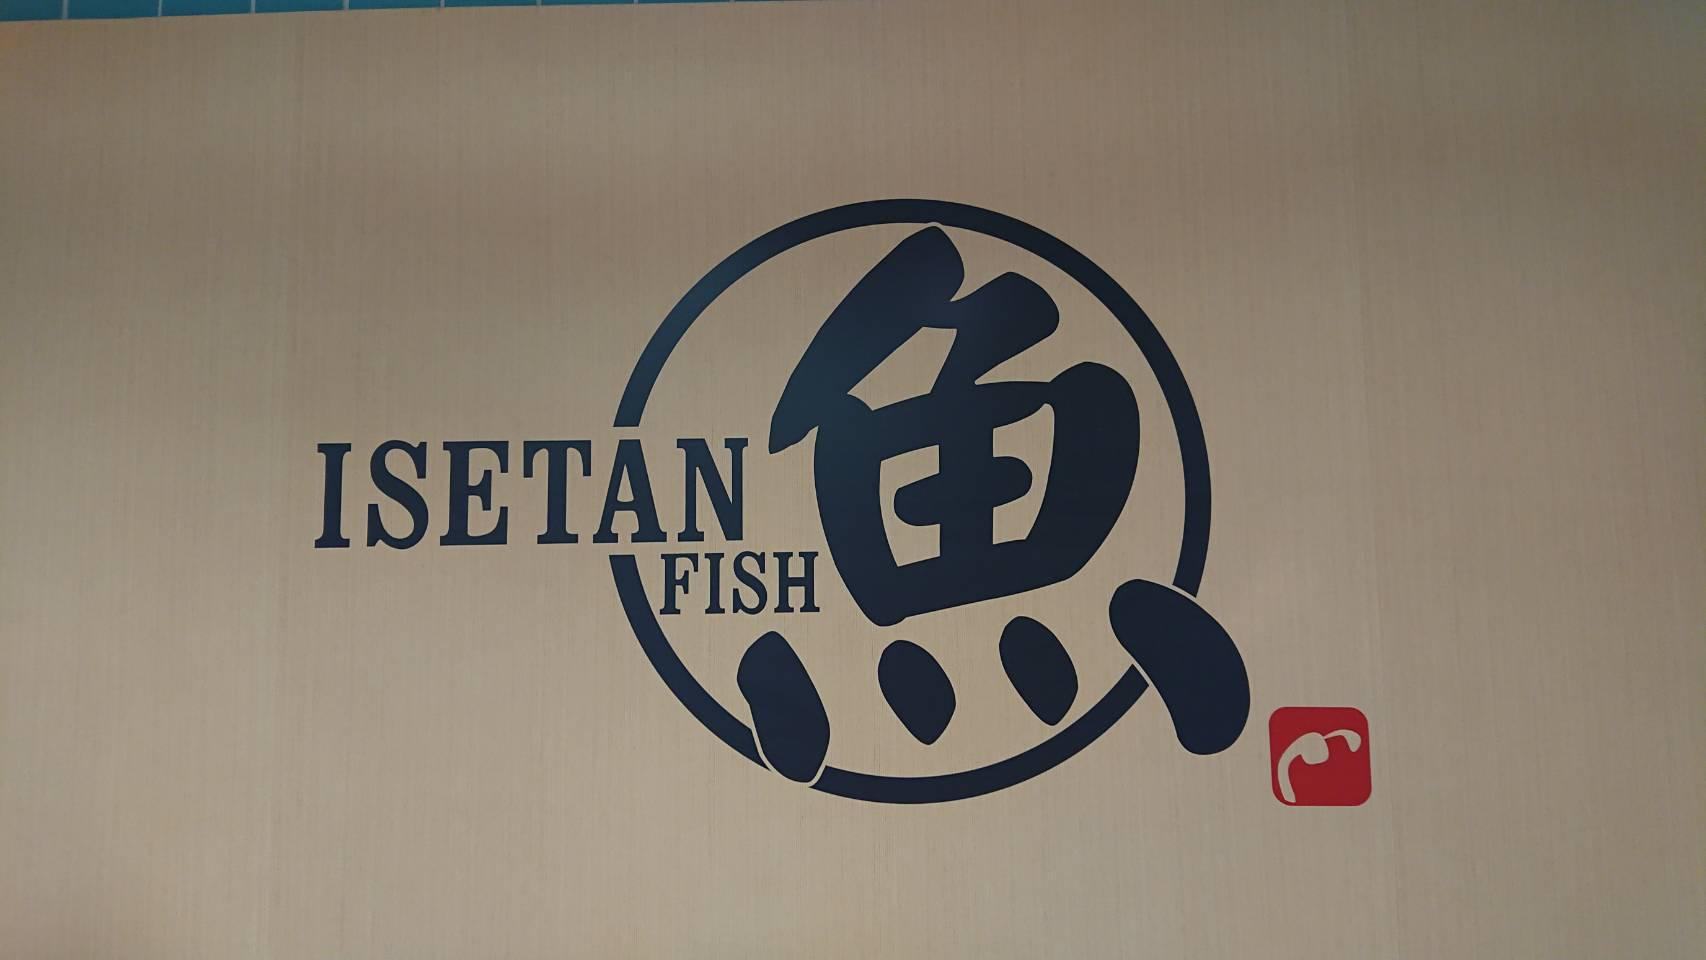 ISETAN FISH(京都市/鮮魚)